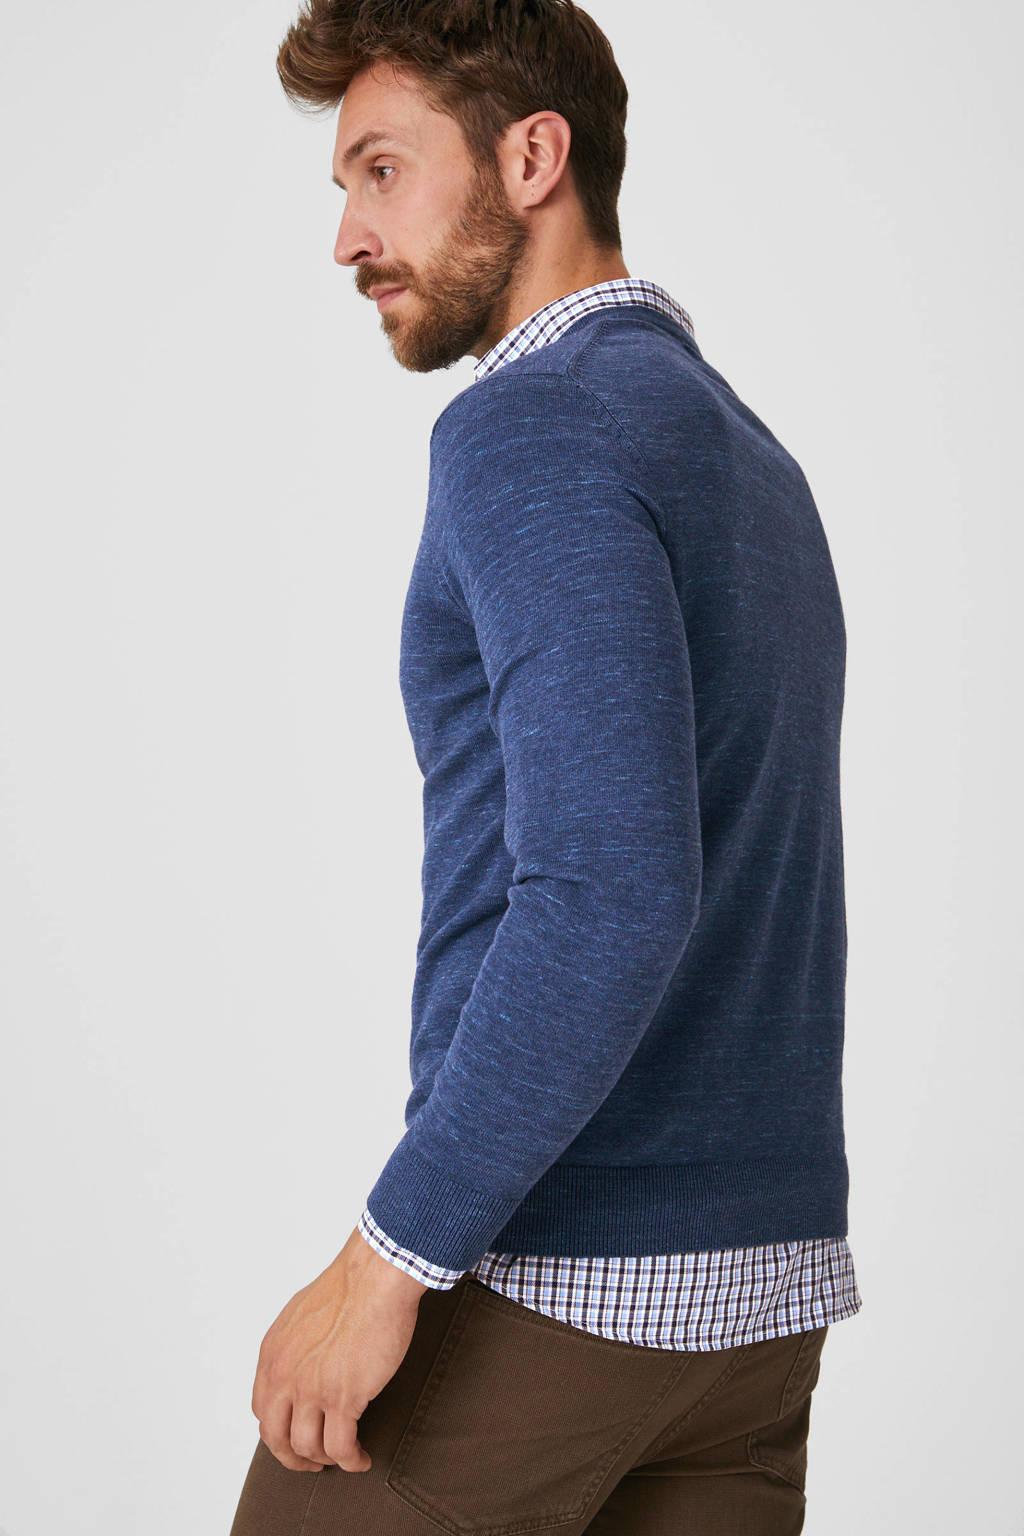 C&A Canda trui met overhemd blauw, Blauw